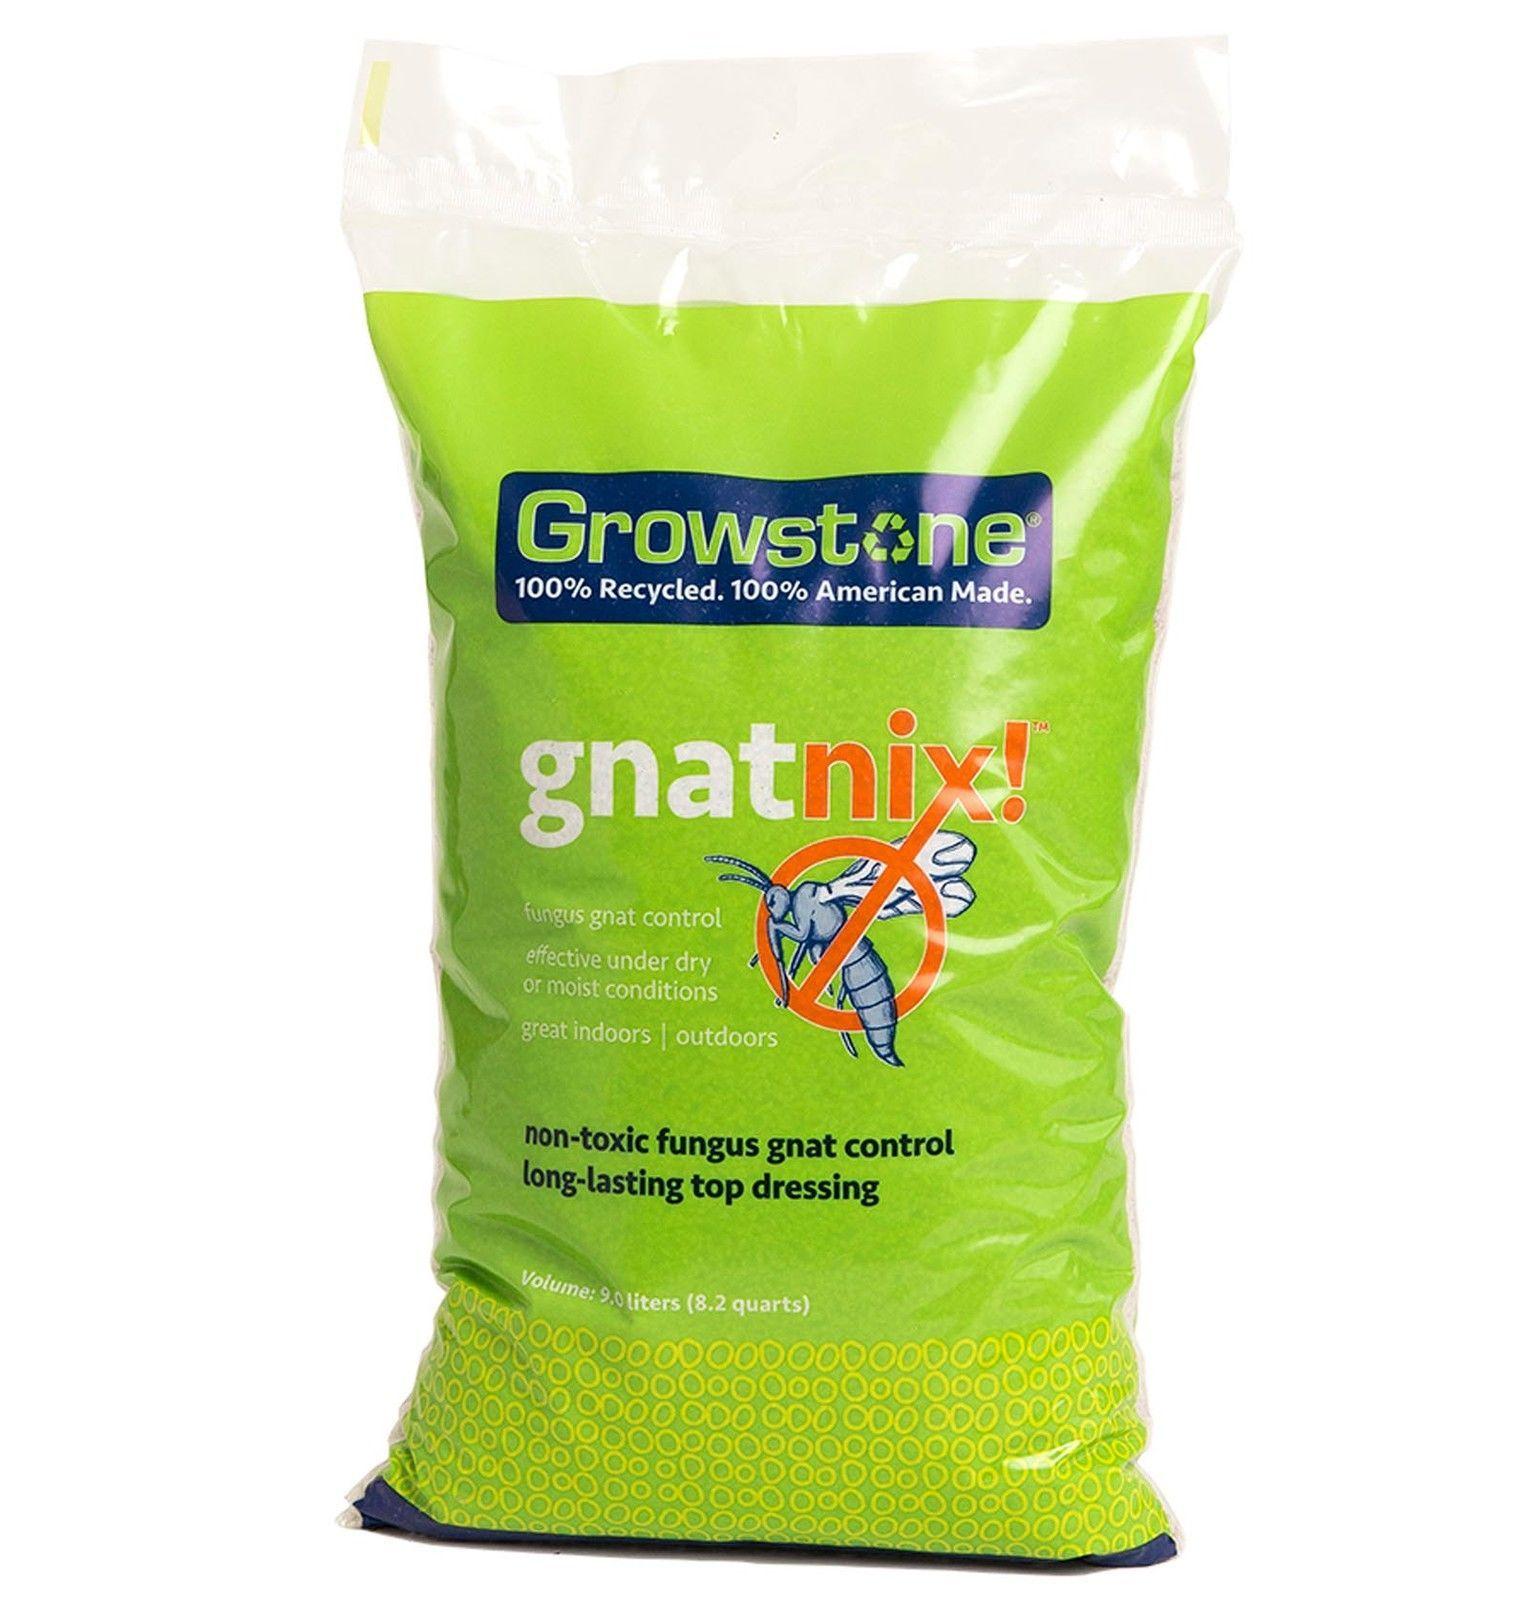 Growstone Gnat Nix 9 Liter ChemicalFree Fungus Gnat